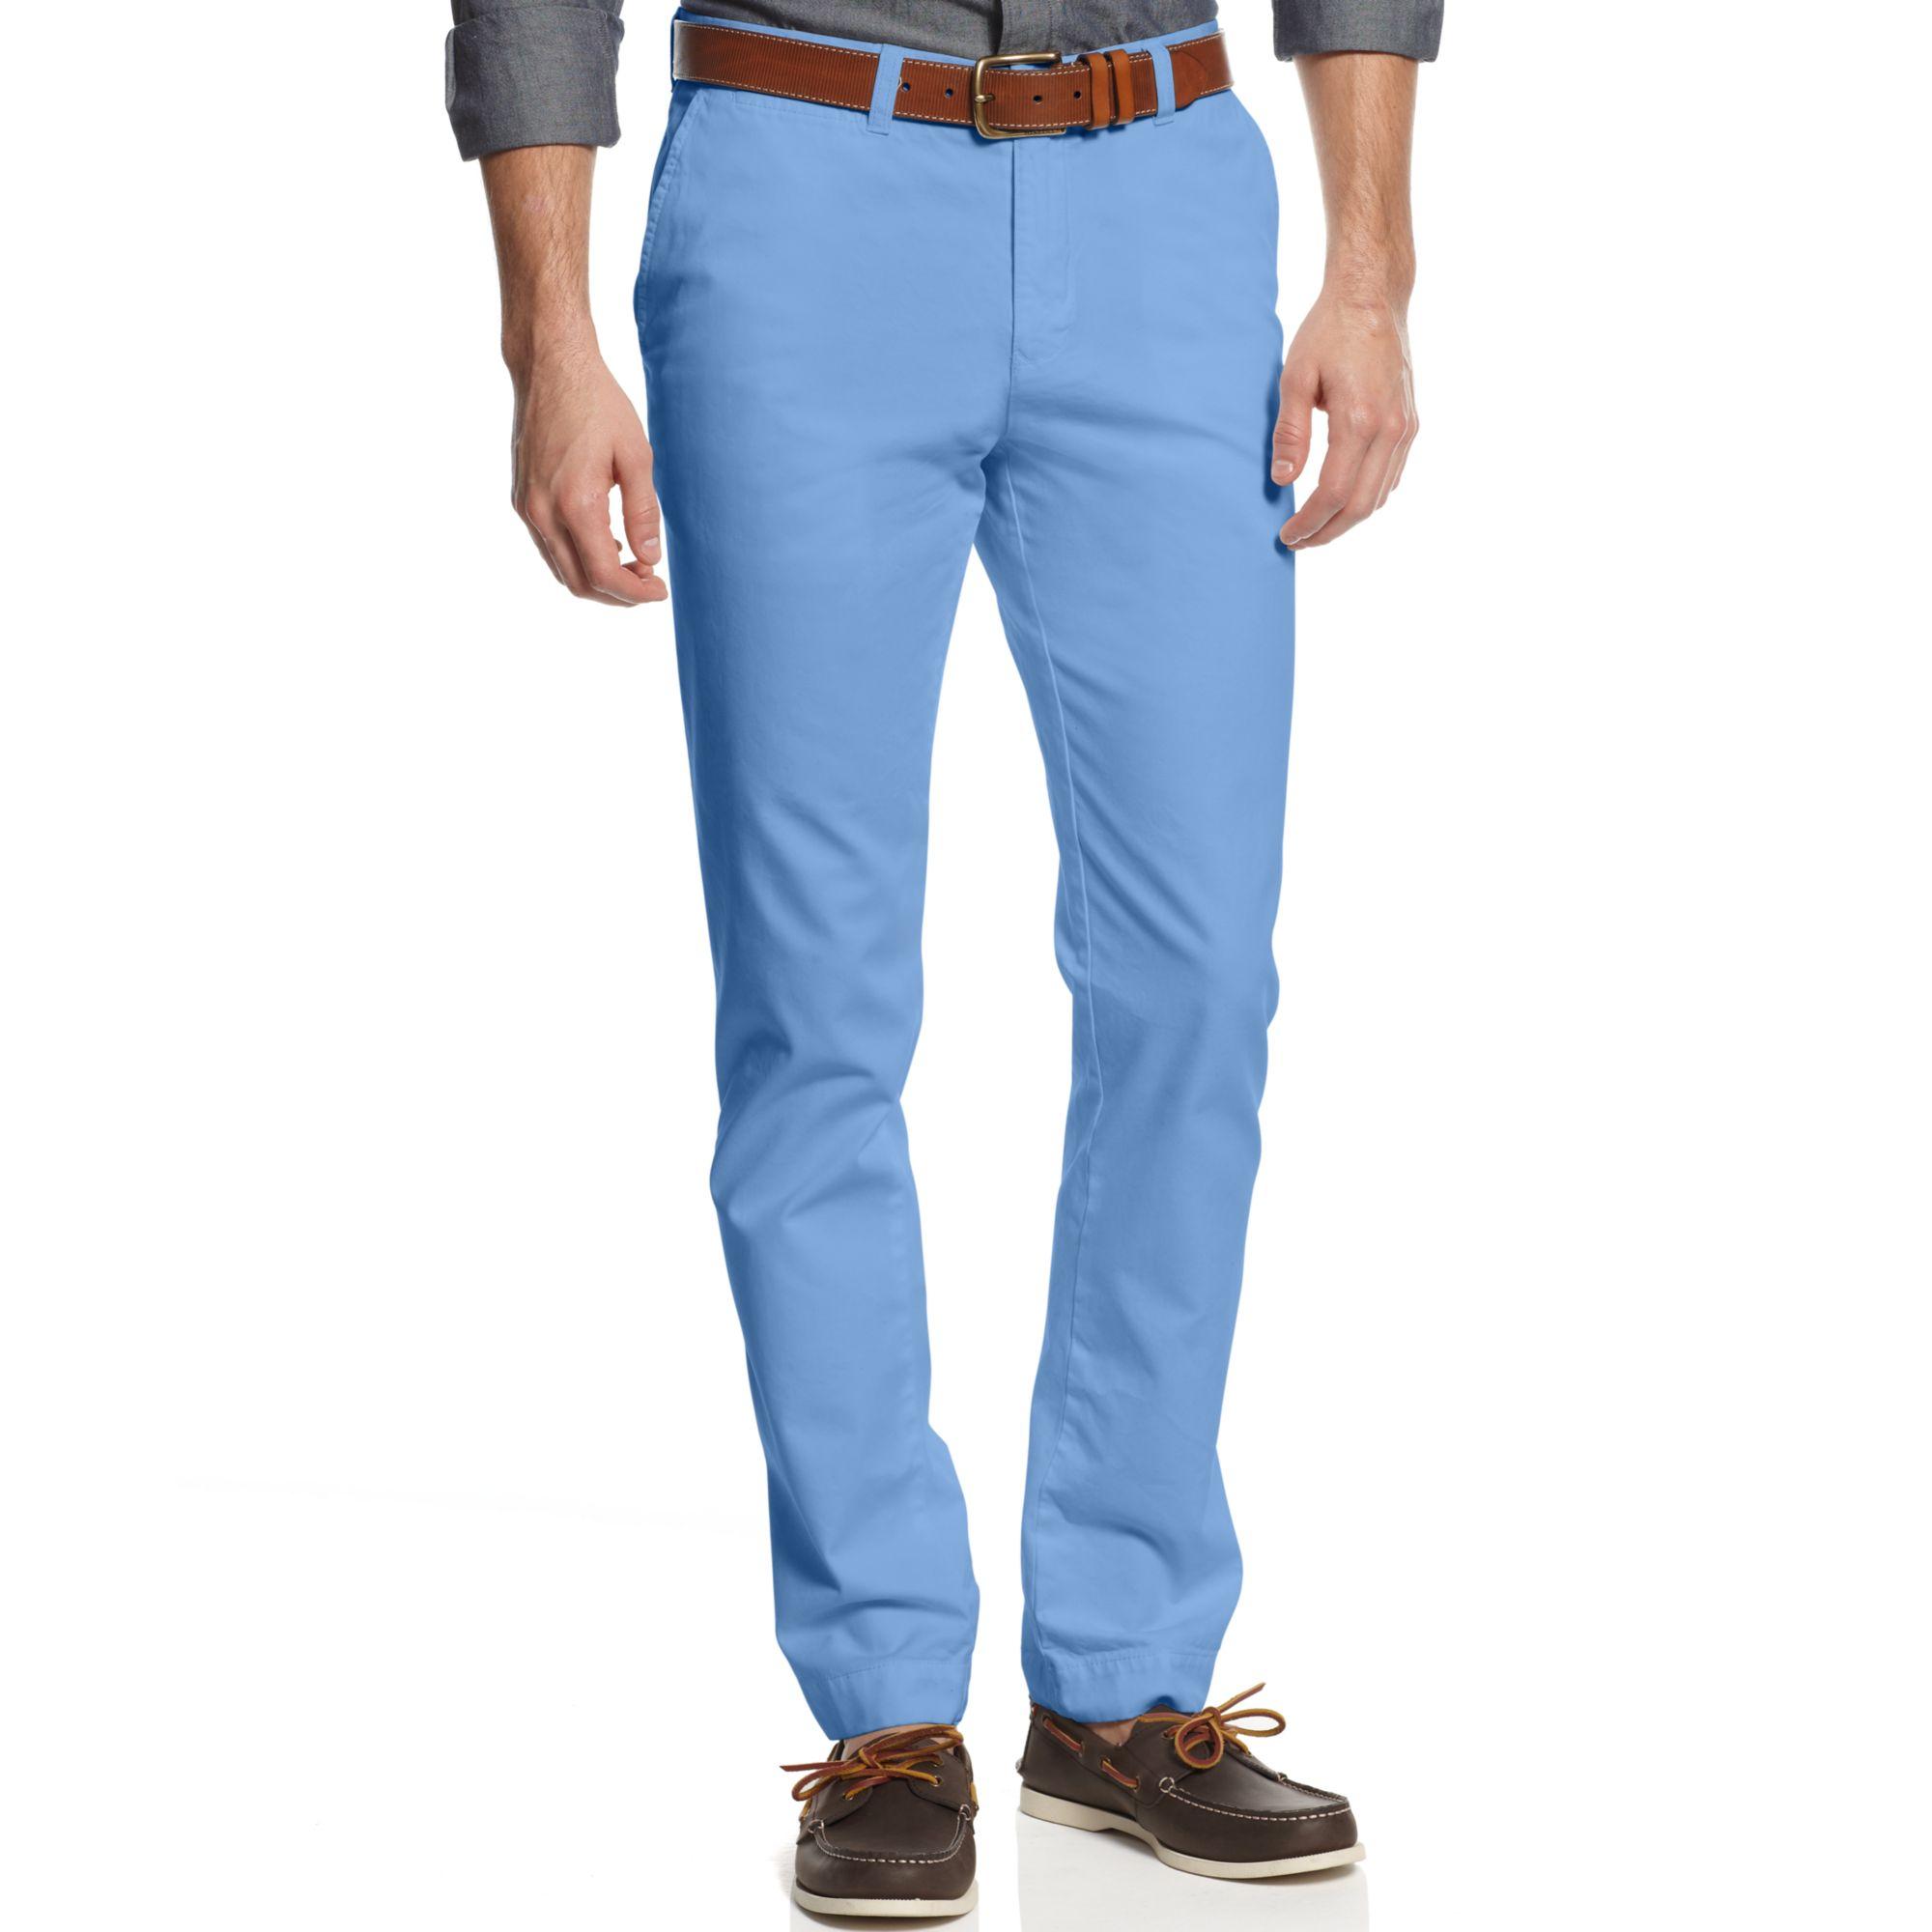 uk availability professional sale brand new Slim Fit Graduate Chino Pants